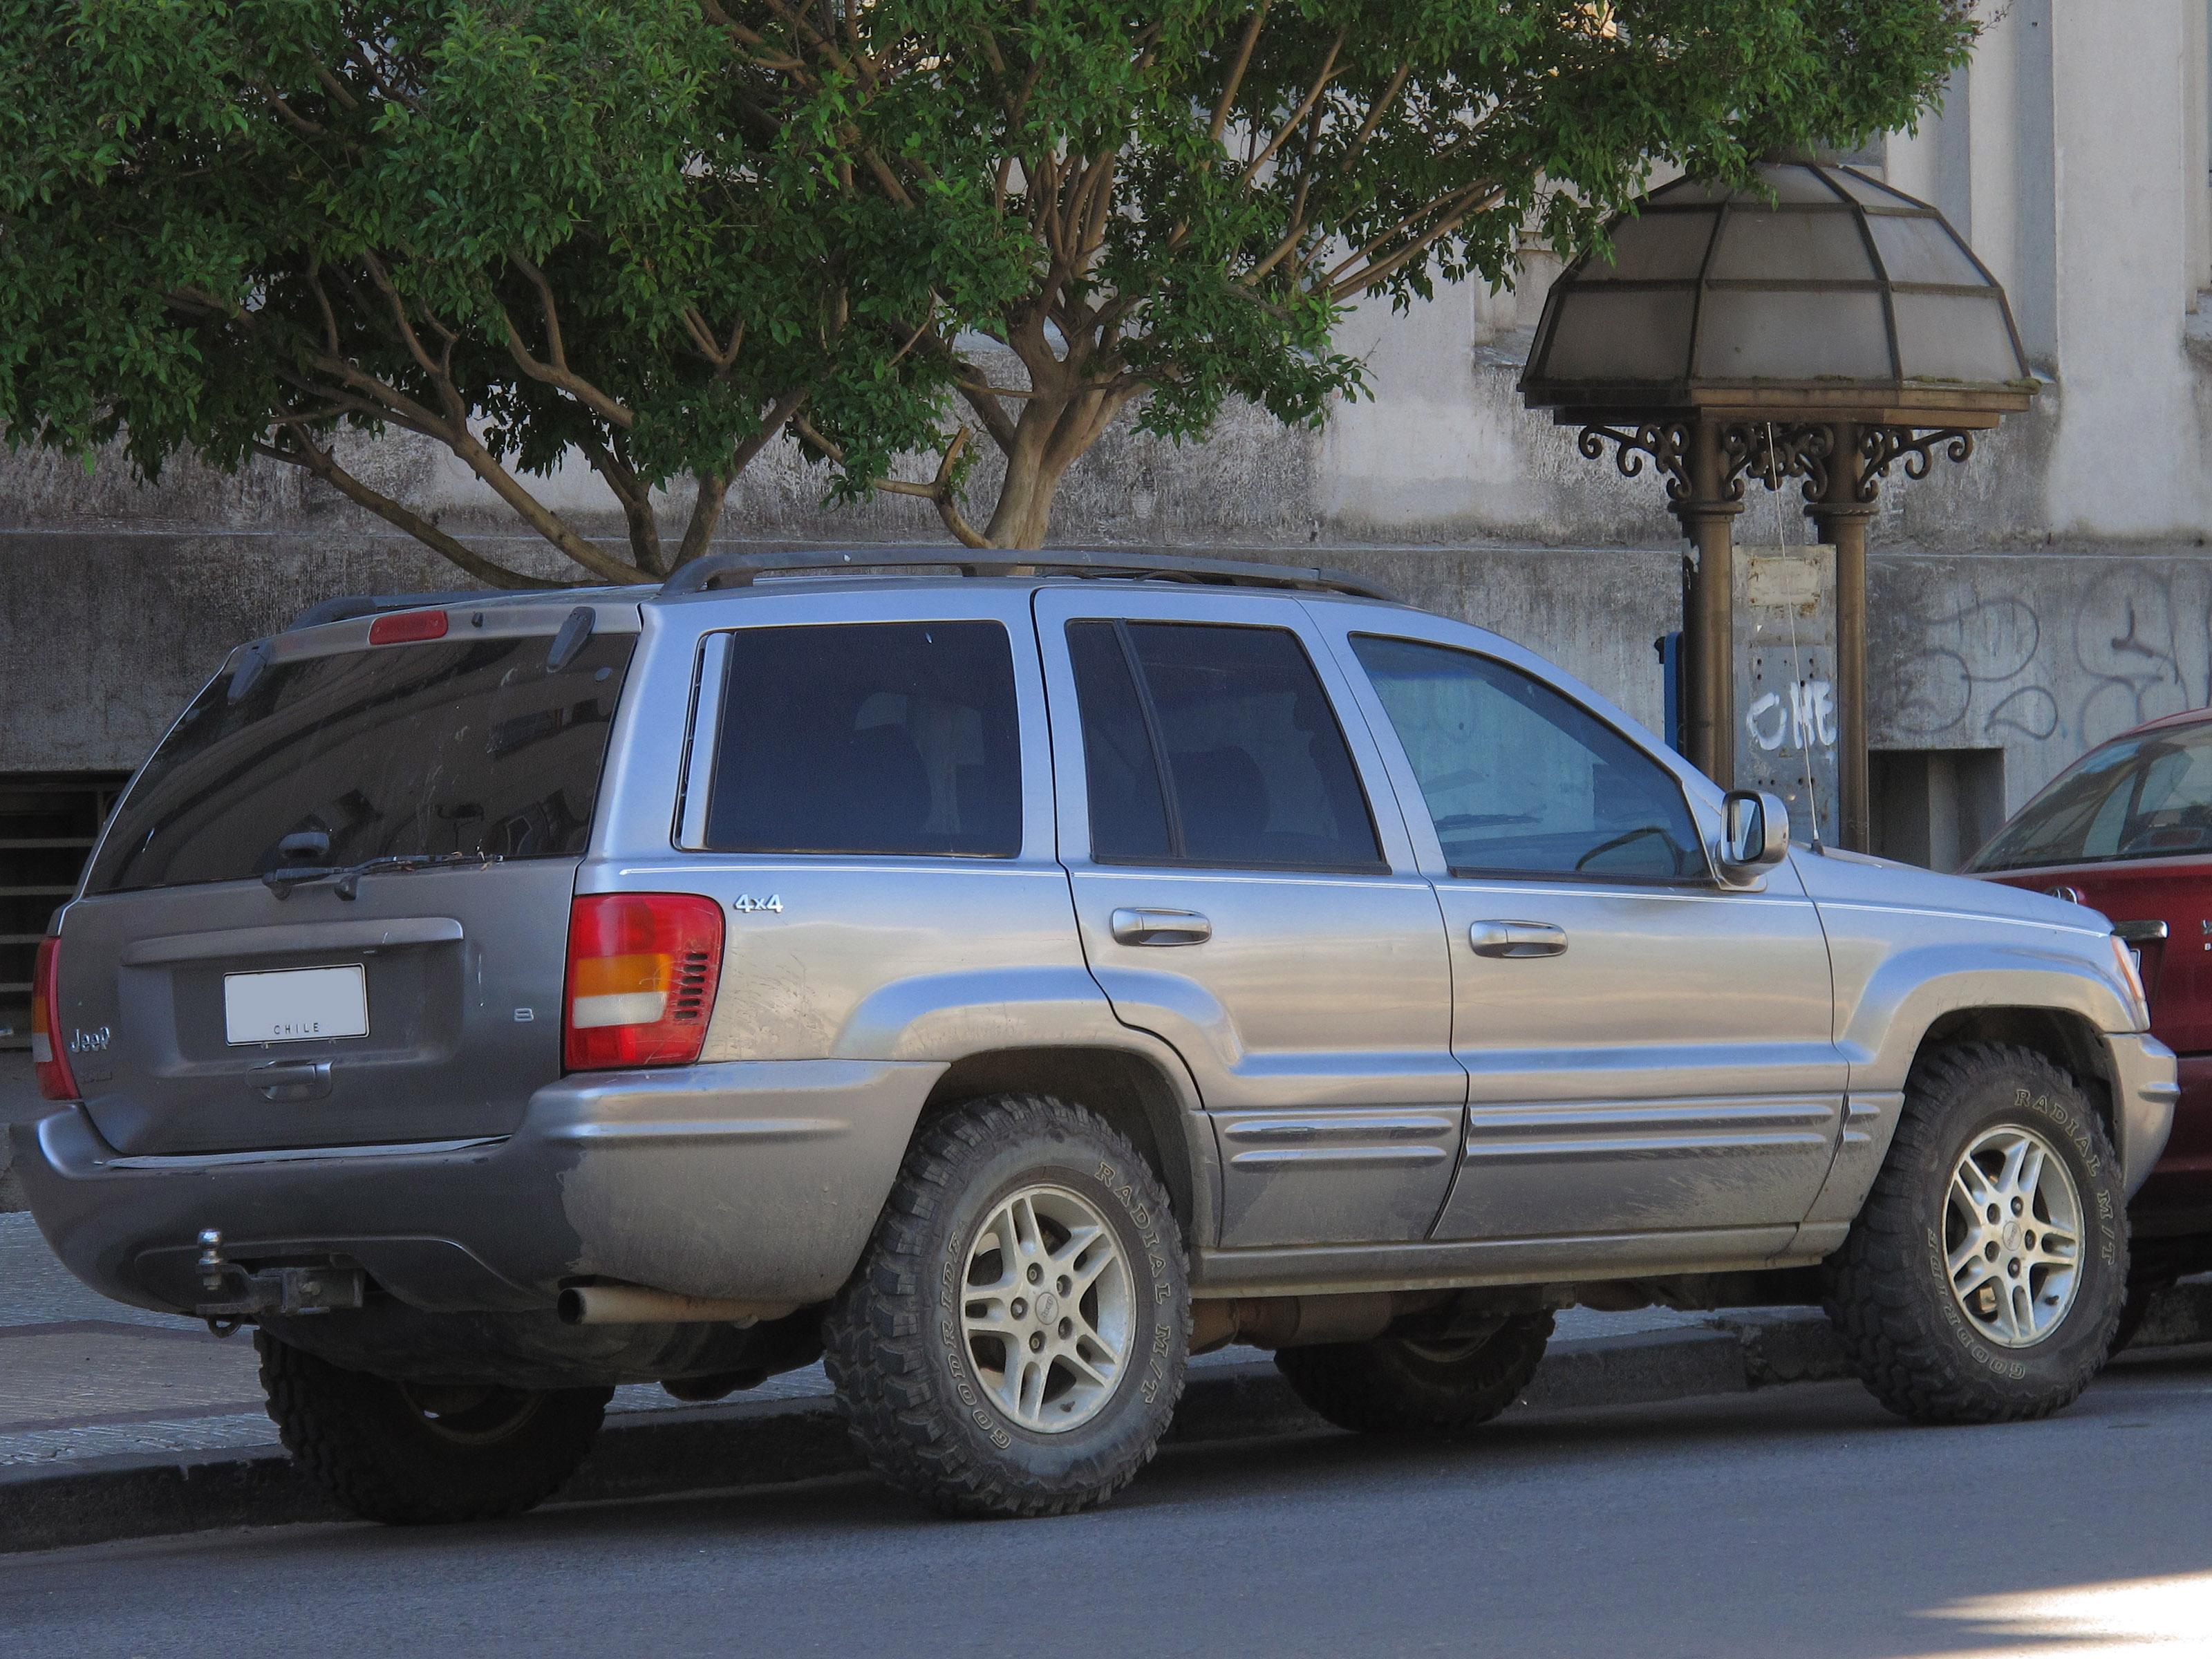 File:Jeep Grand Cherokee 4.7 Limited 1999 (16126223880).jpg